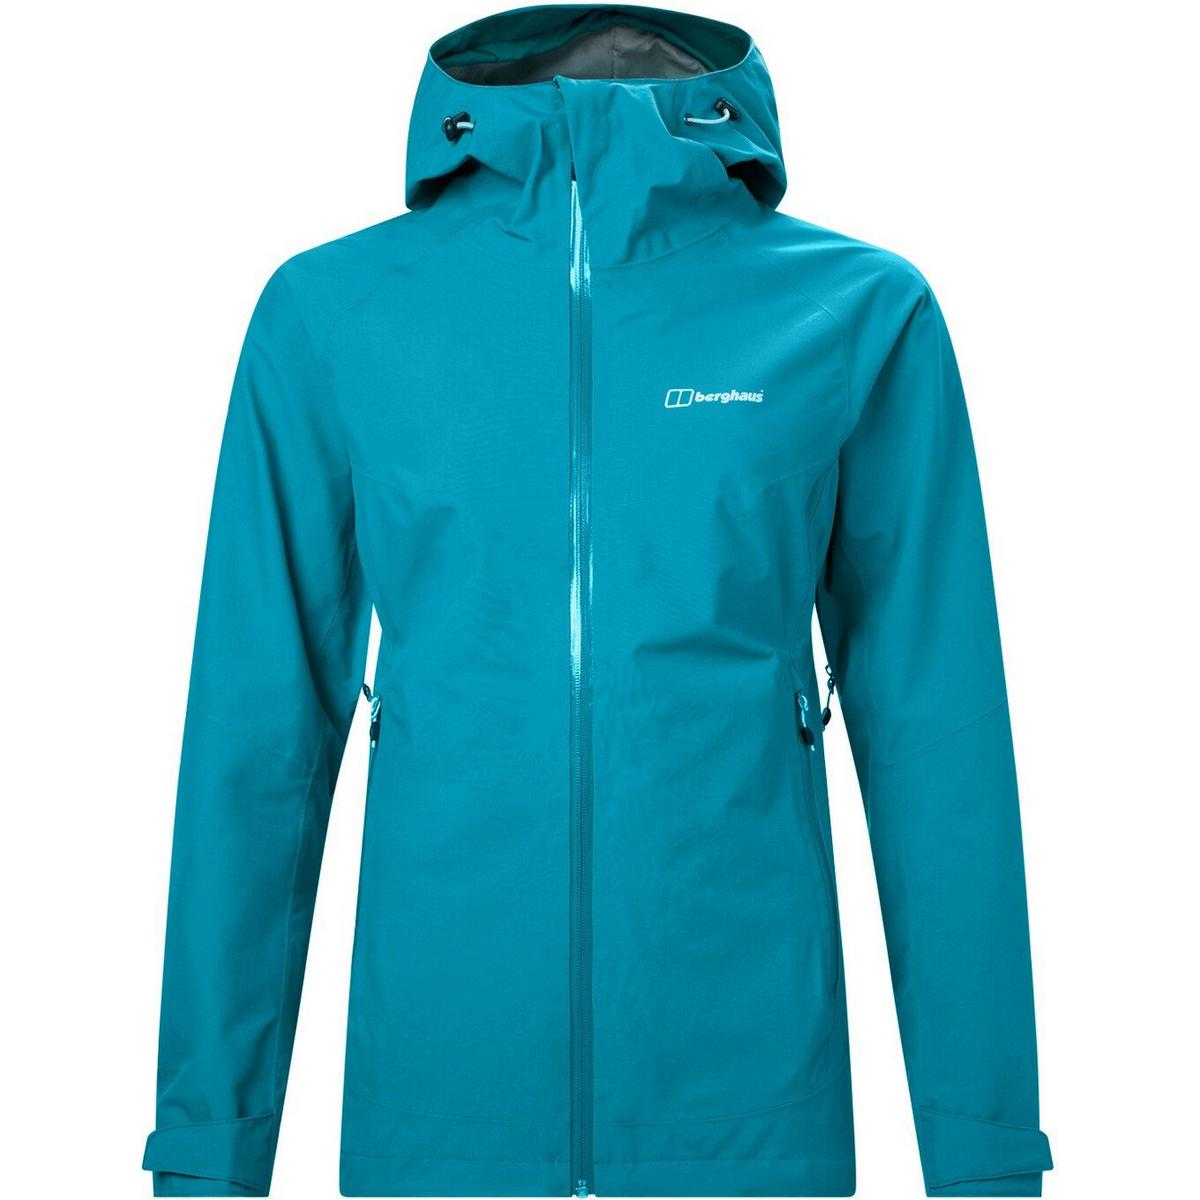 Berghaus Women's Berghaus Ridgemaster Vented Waterproof Jacket - Blue